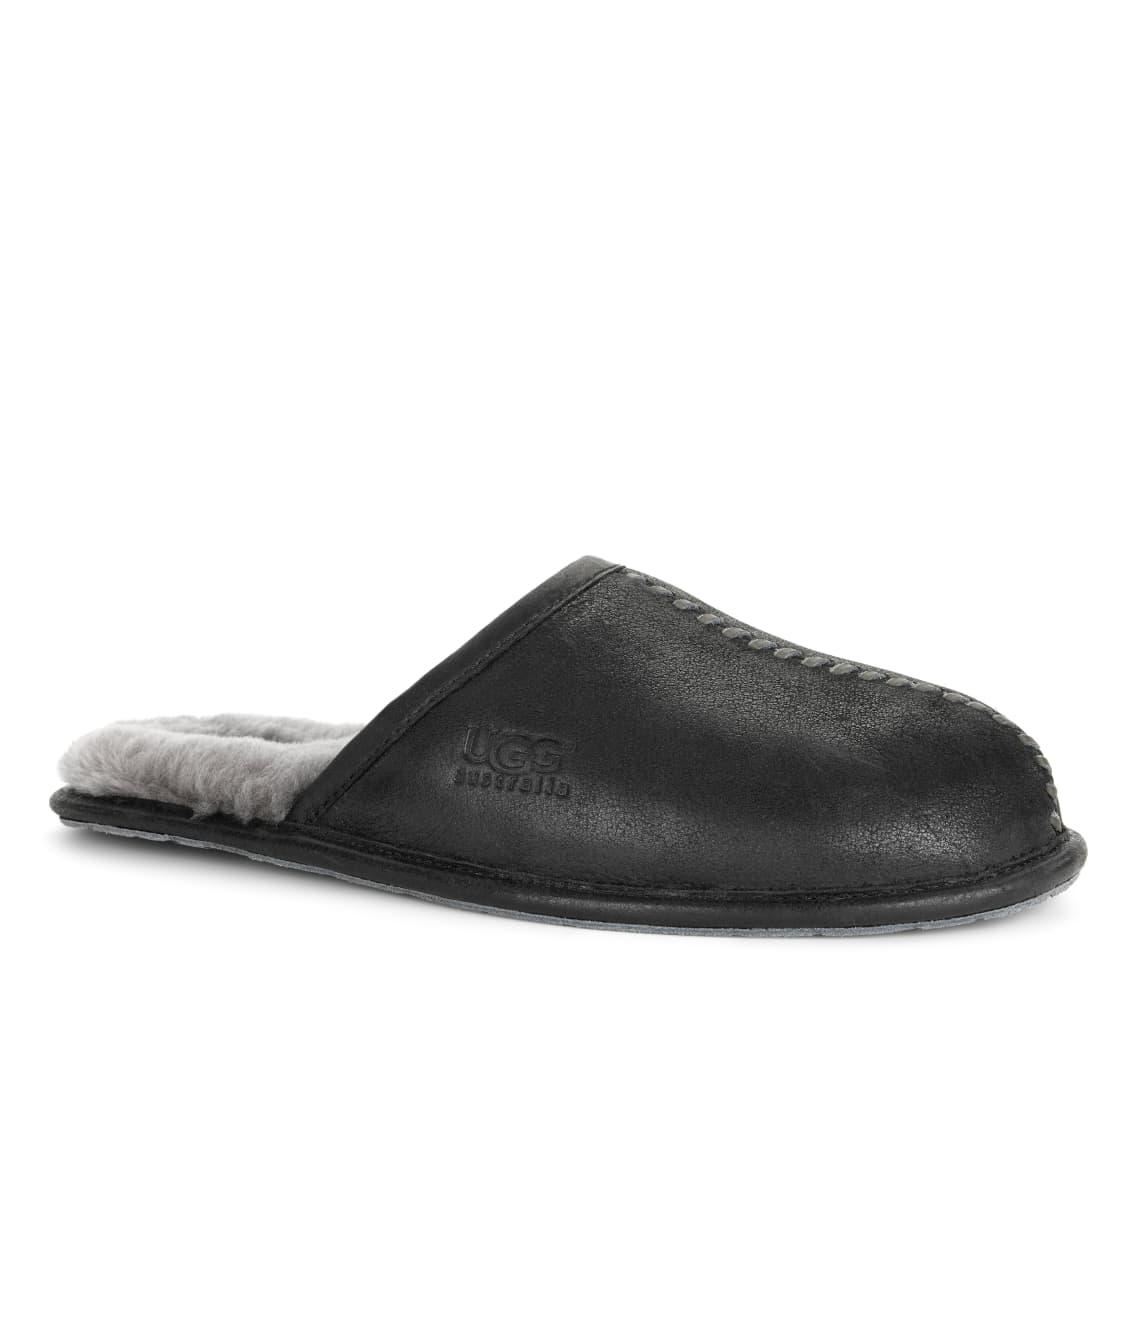 ff2281f7b4b Men's Scuff Deco Slippers